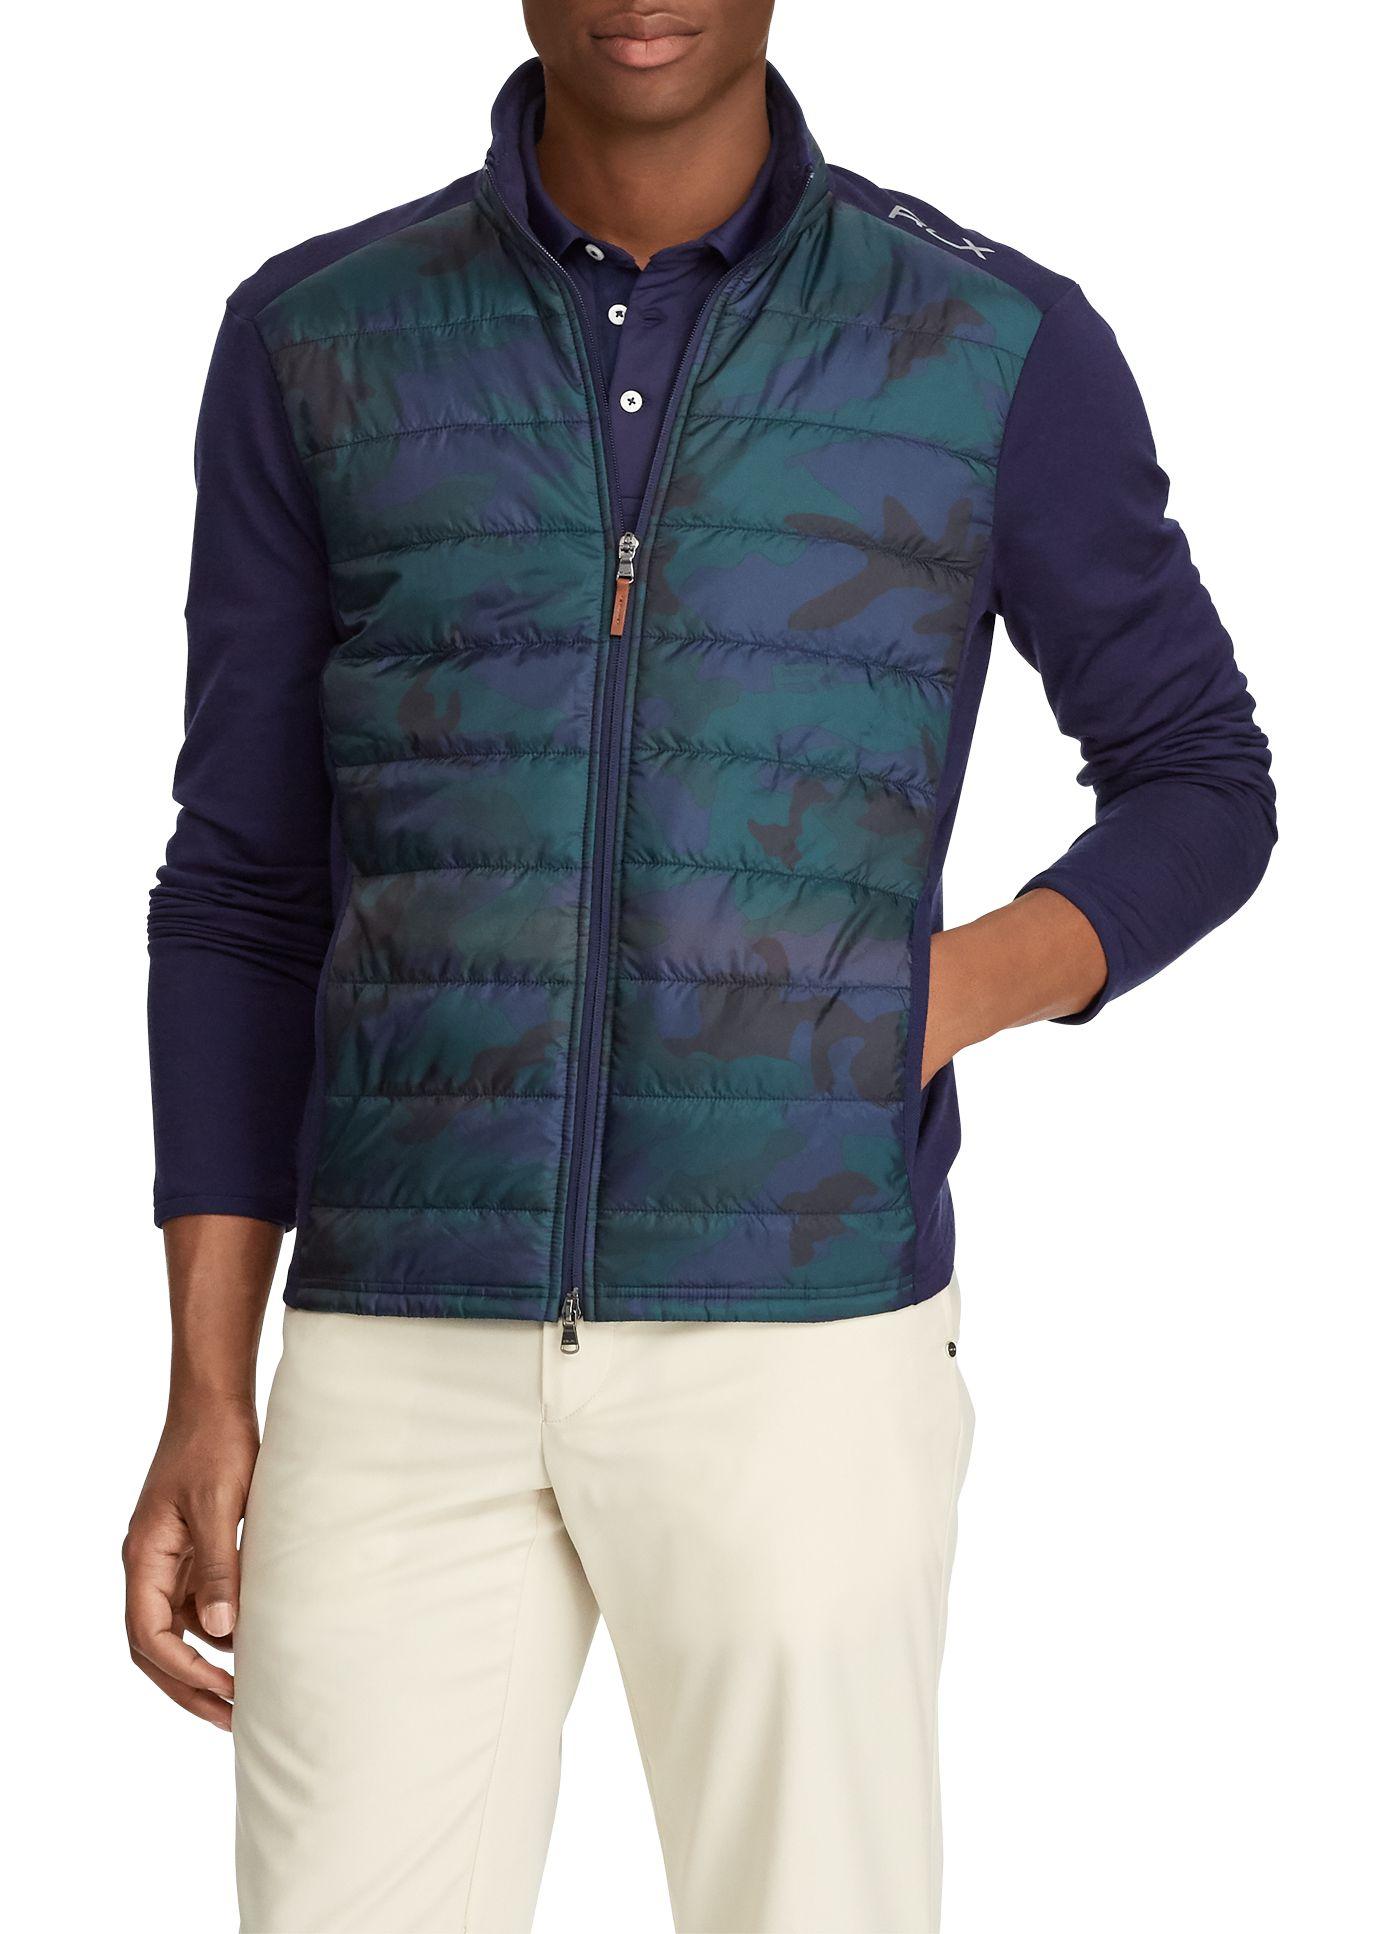 RLX Golf Men's Cool Wool Golf Jacket